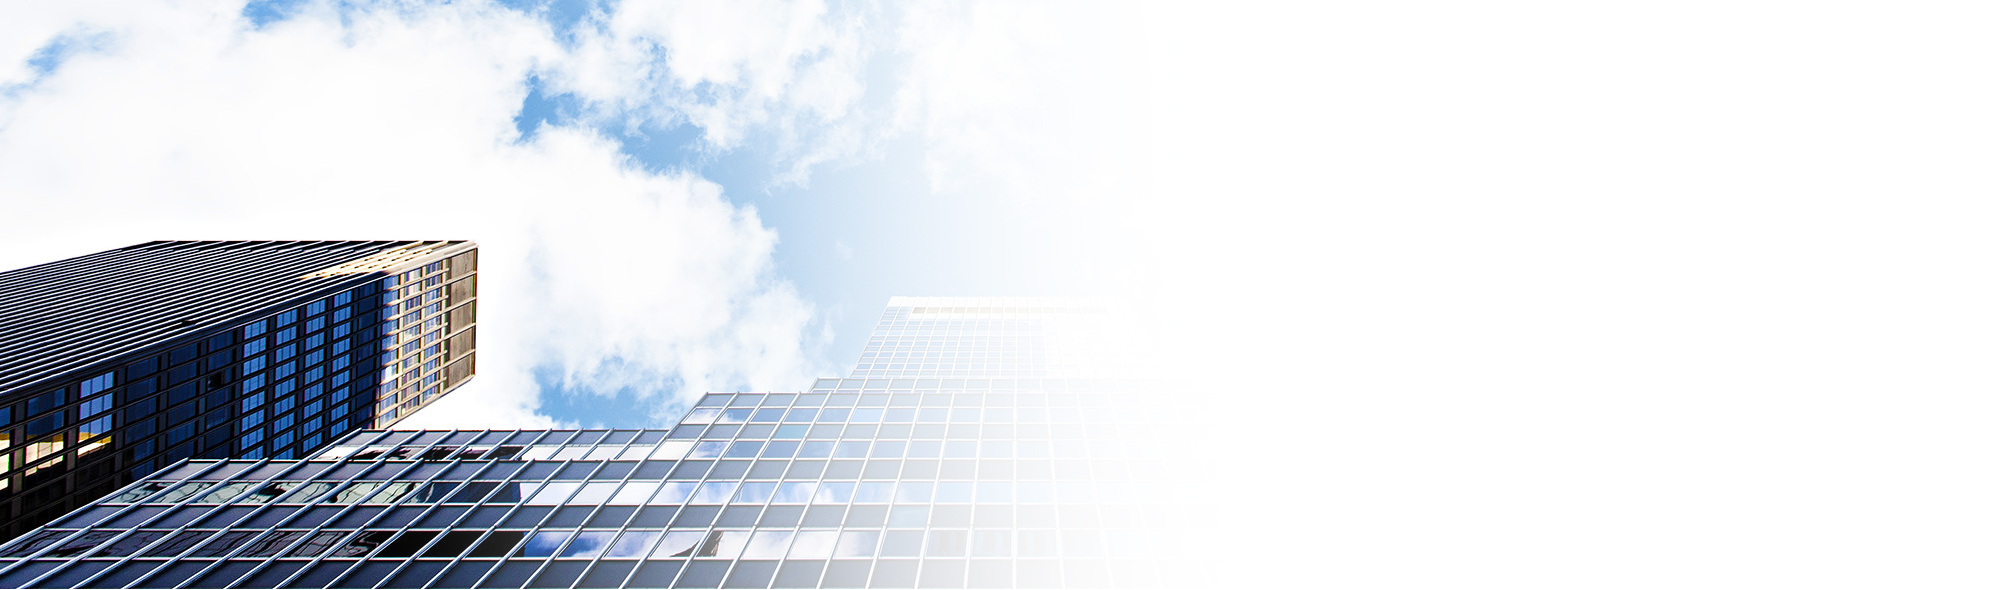 Reimagine hybrid cloud storage for the enterprise